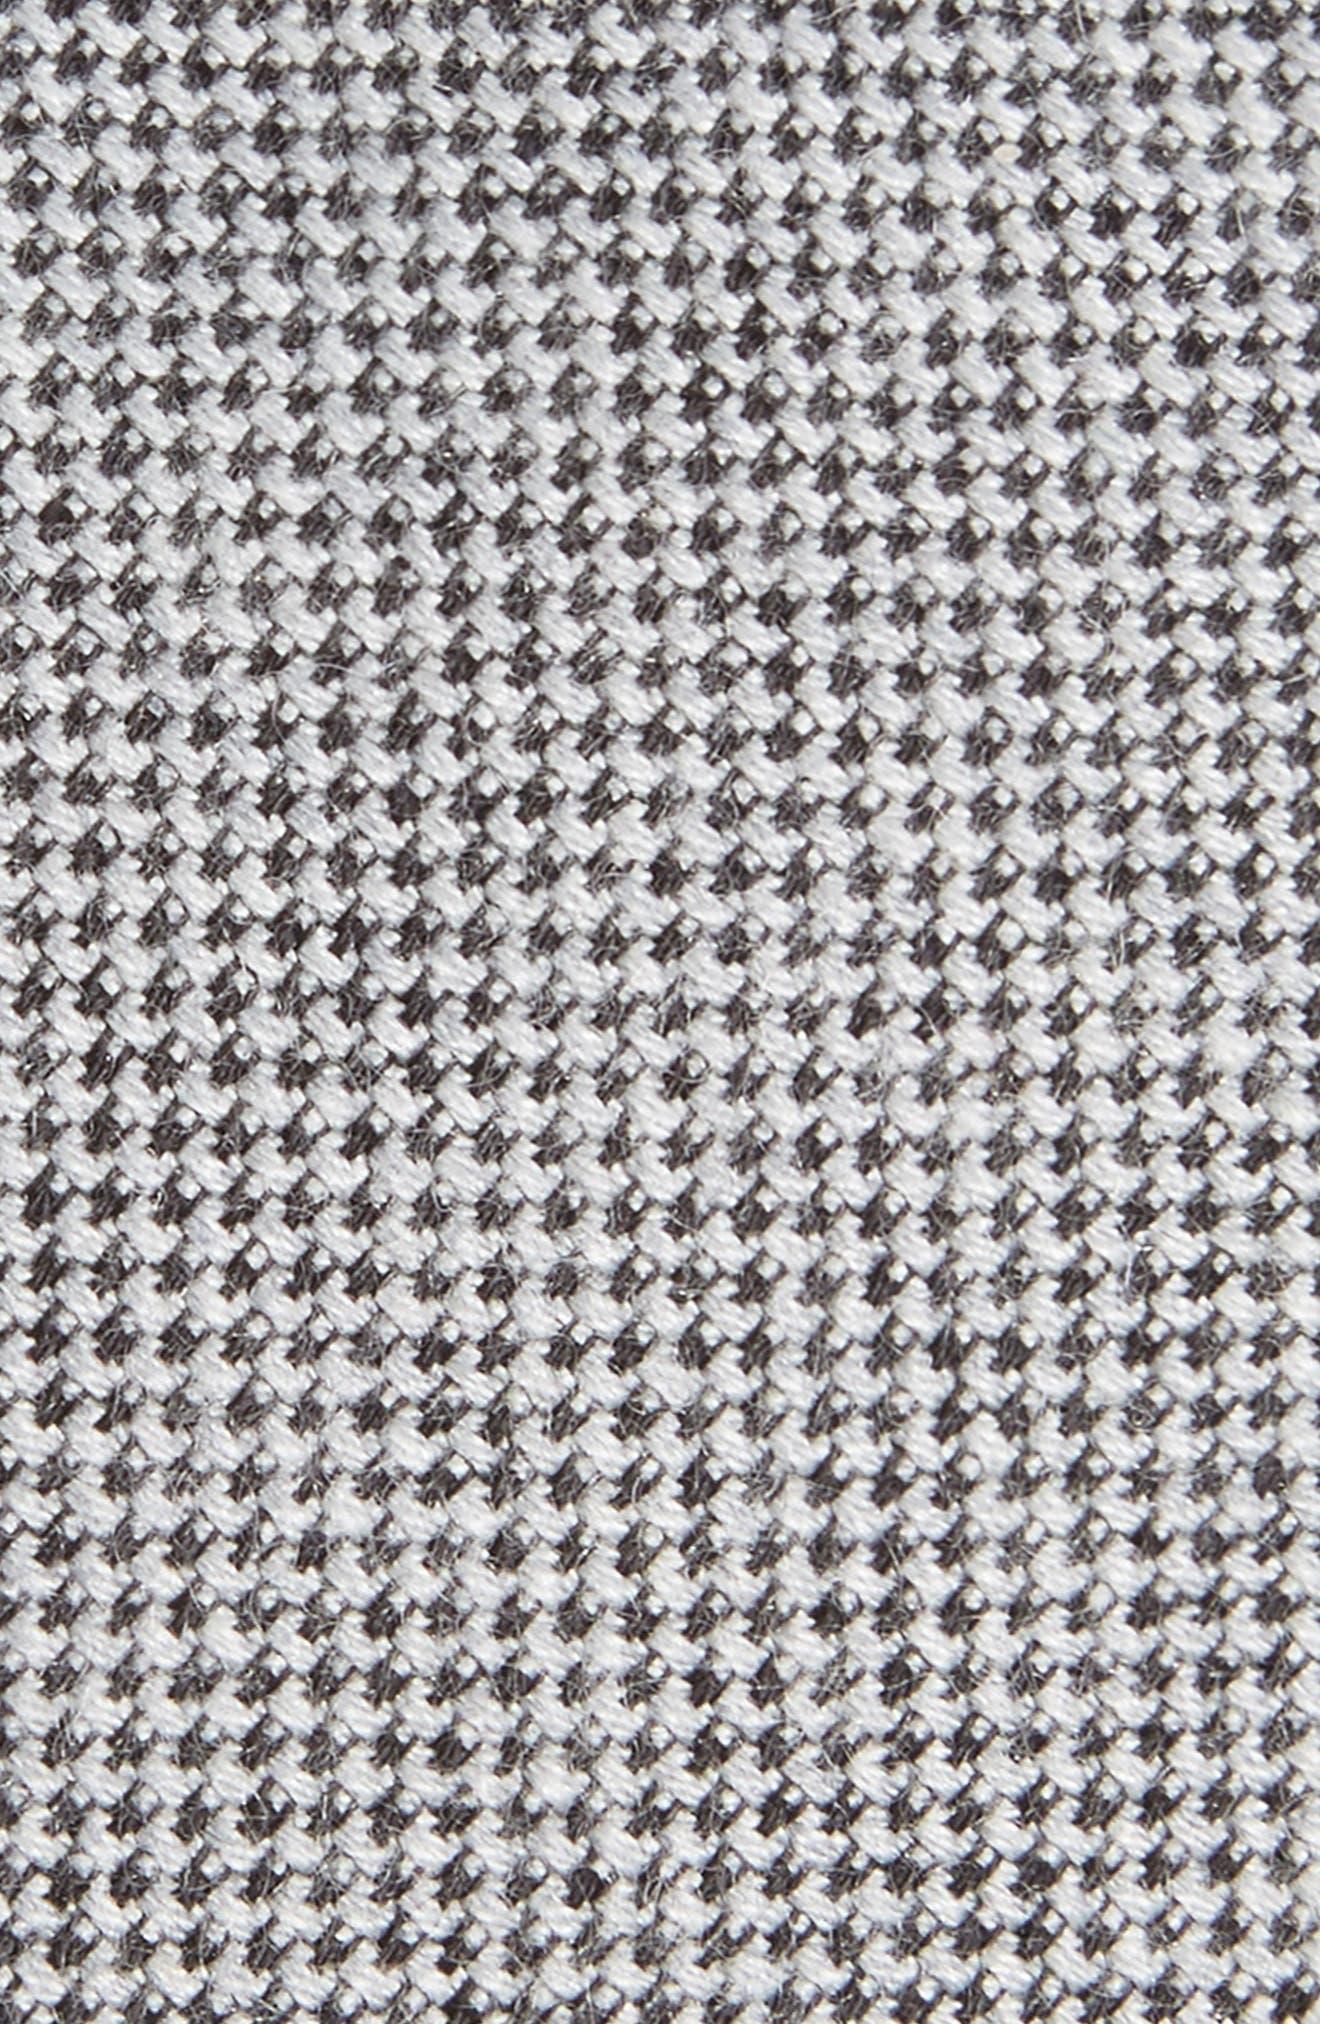 Small Bird's Eye Silk Blend Tie,                             Alternate thumbnail 2, color,                             Birdseye Black